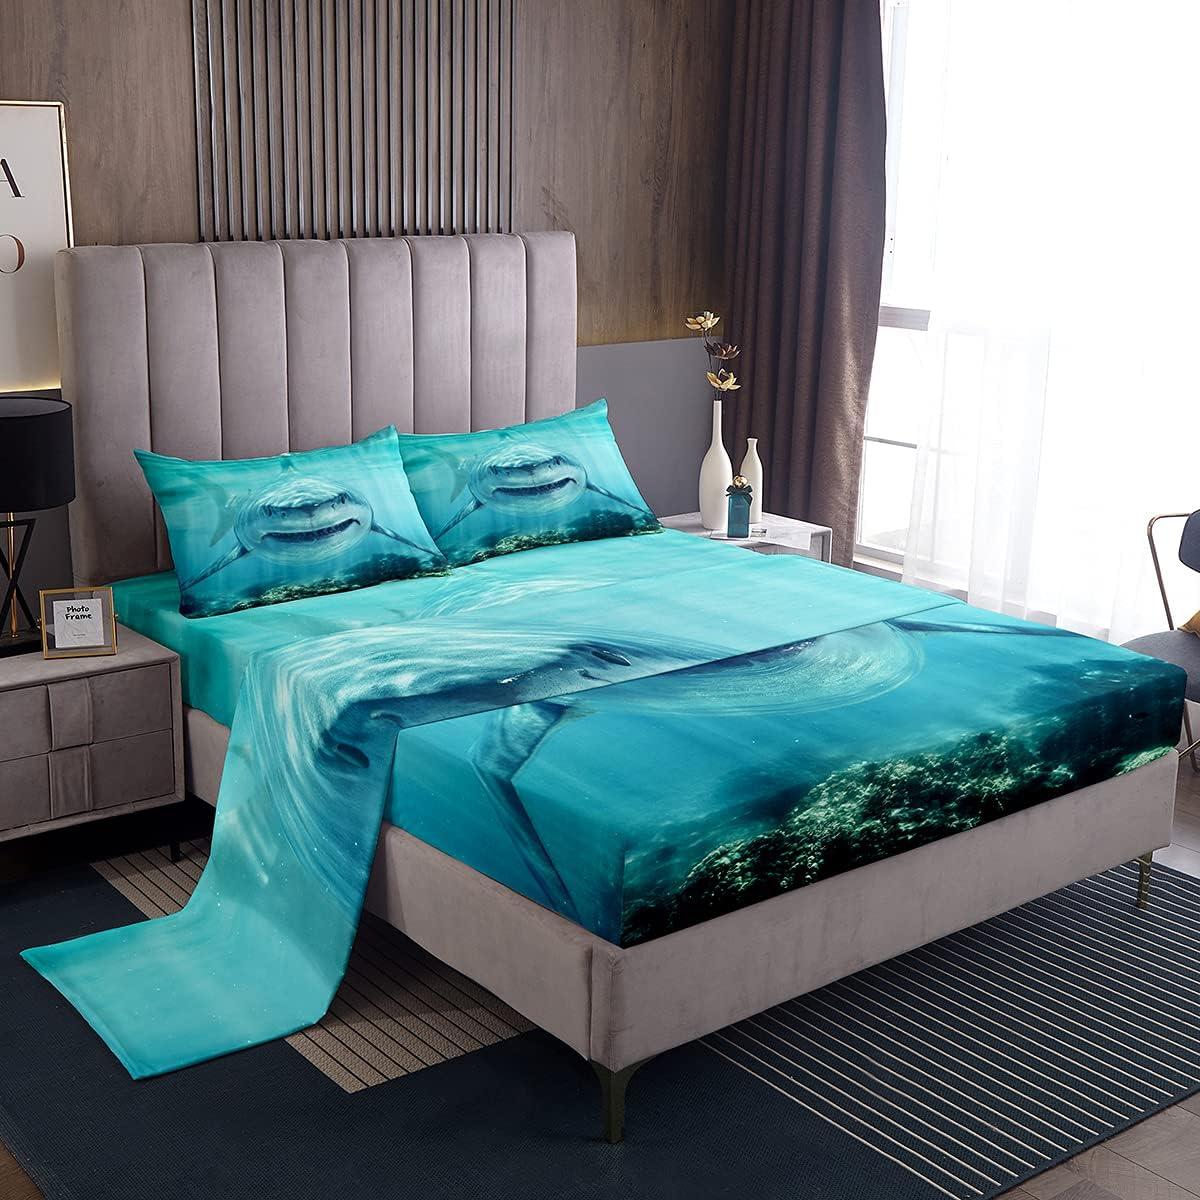 3D Shark Sheet trend rank Set Sales results No. 1 For Kids Ocean B Marine Life Teens Boys